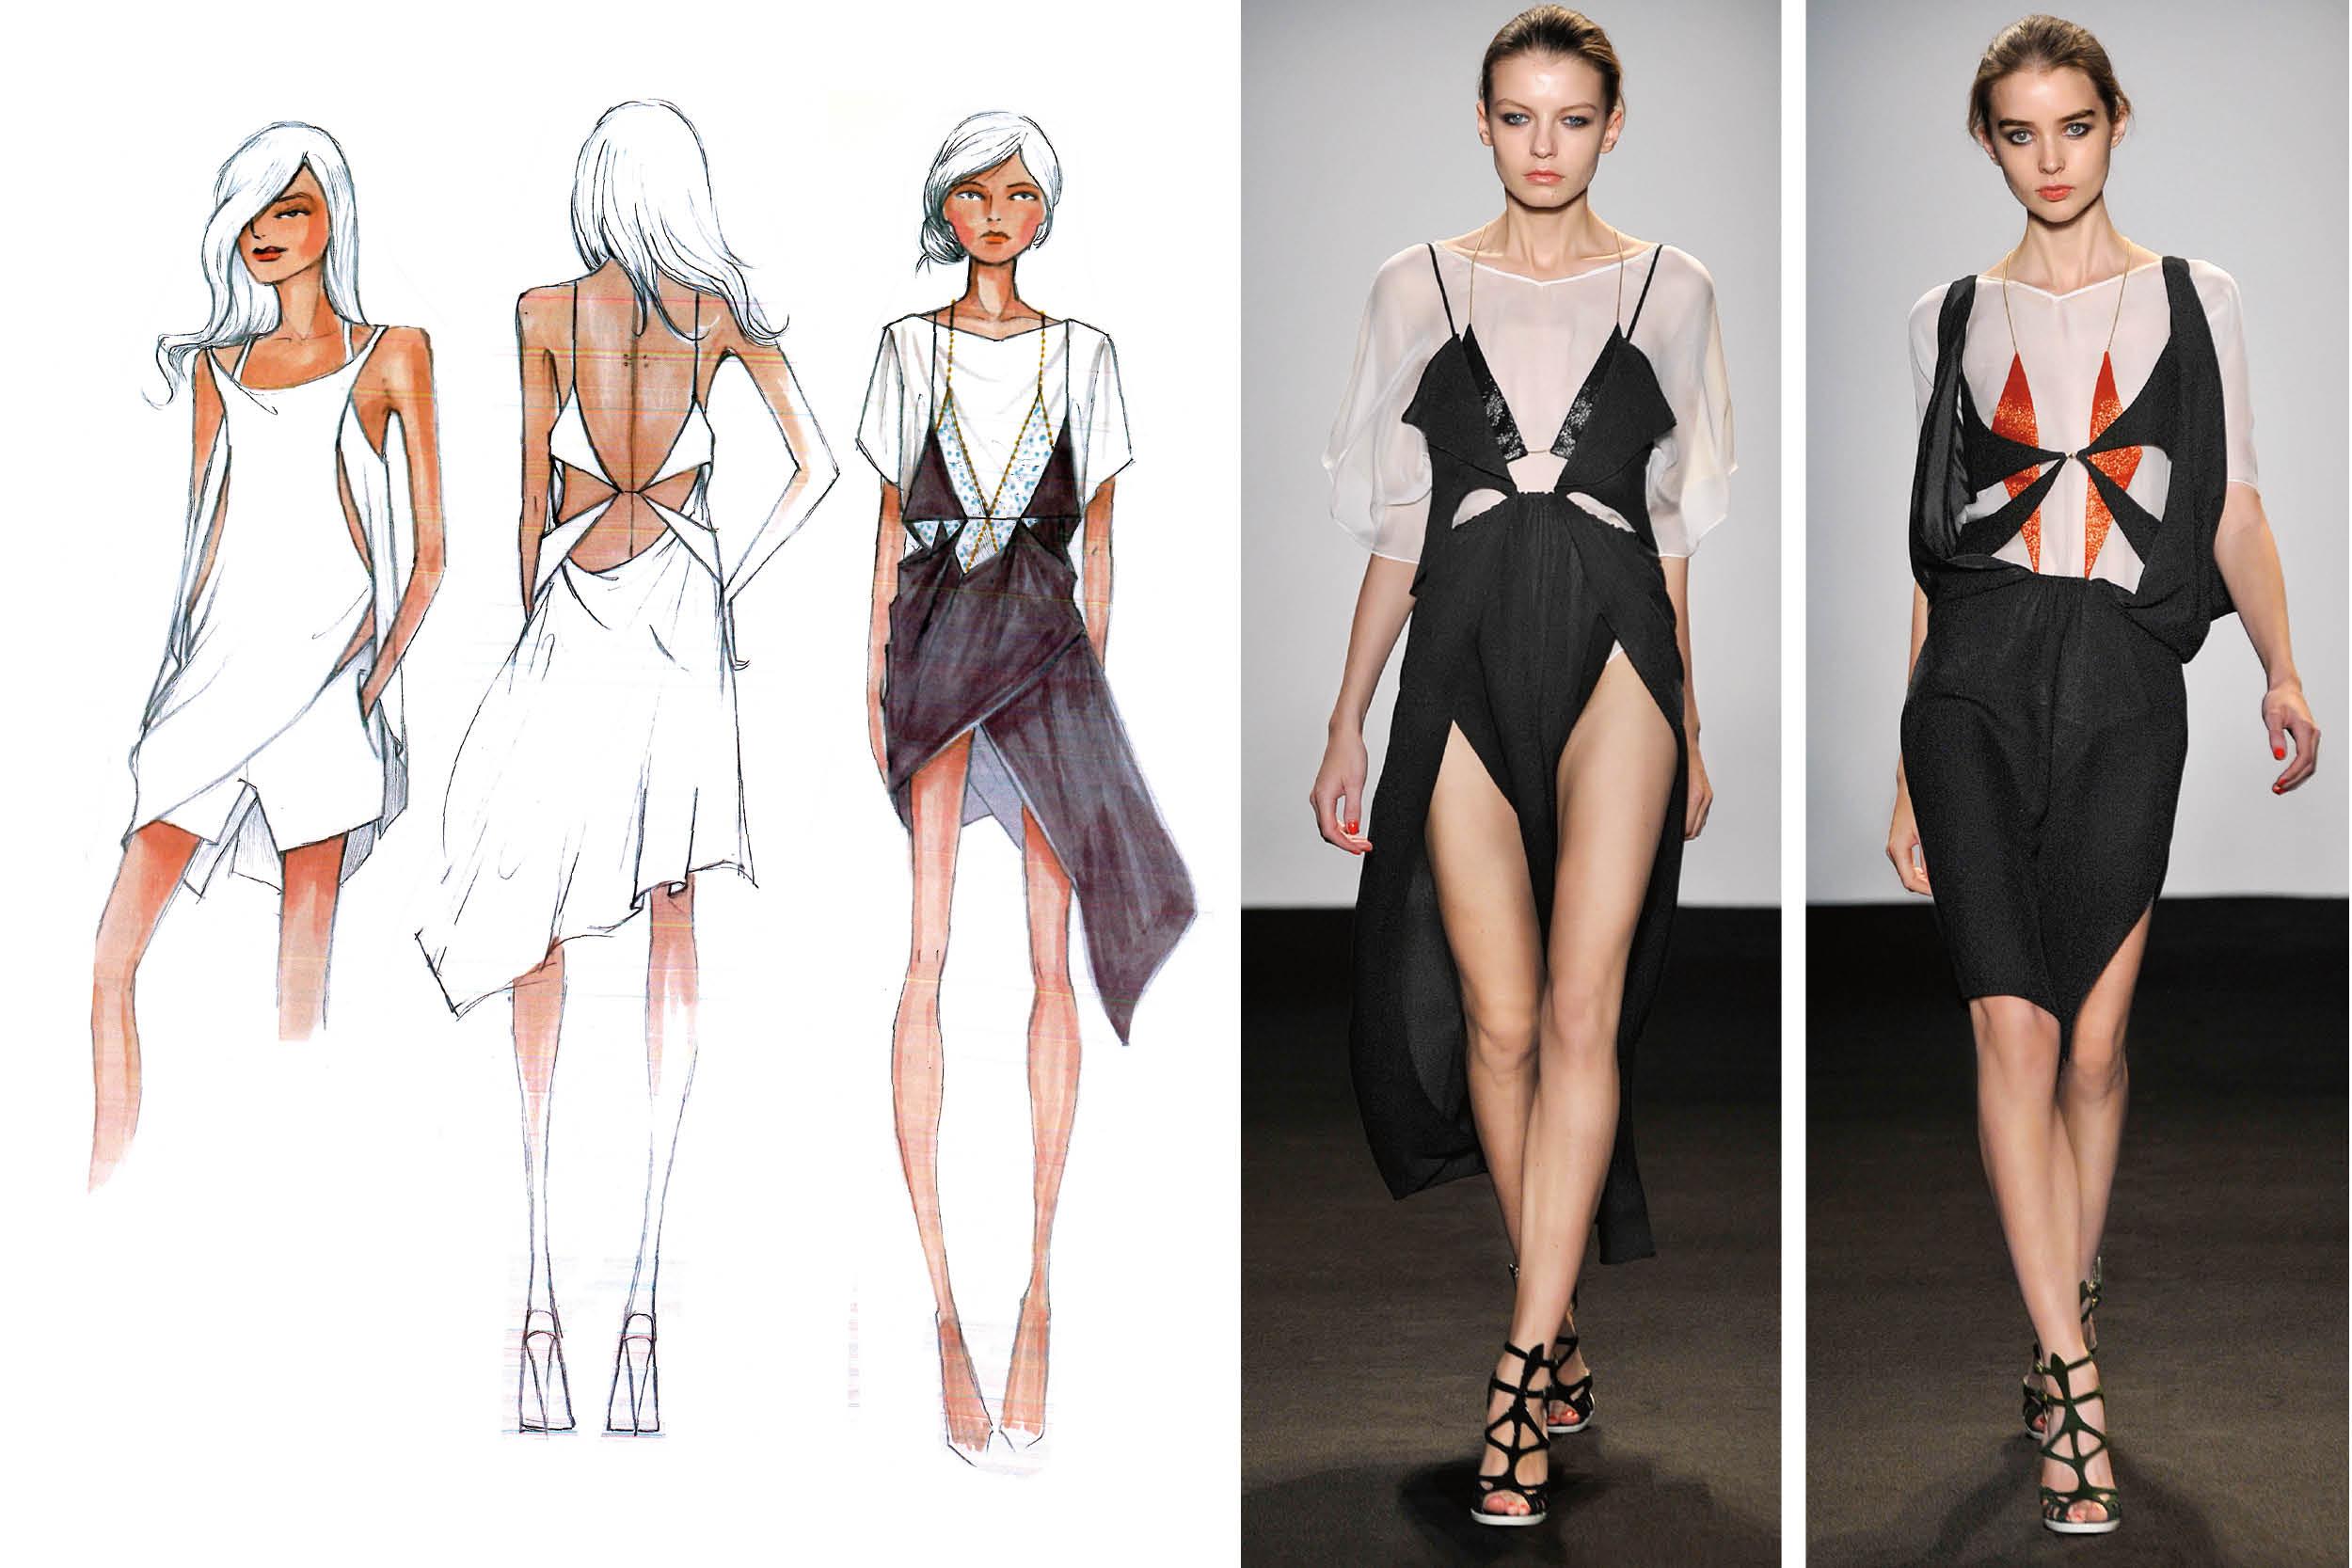 créatrice de mode